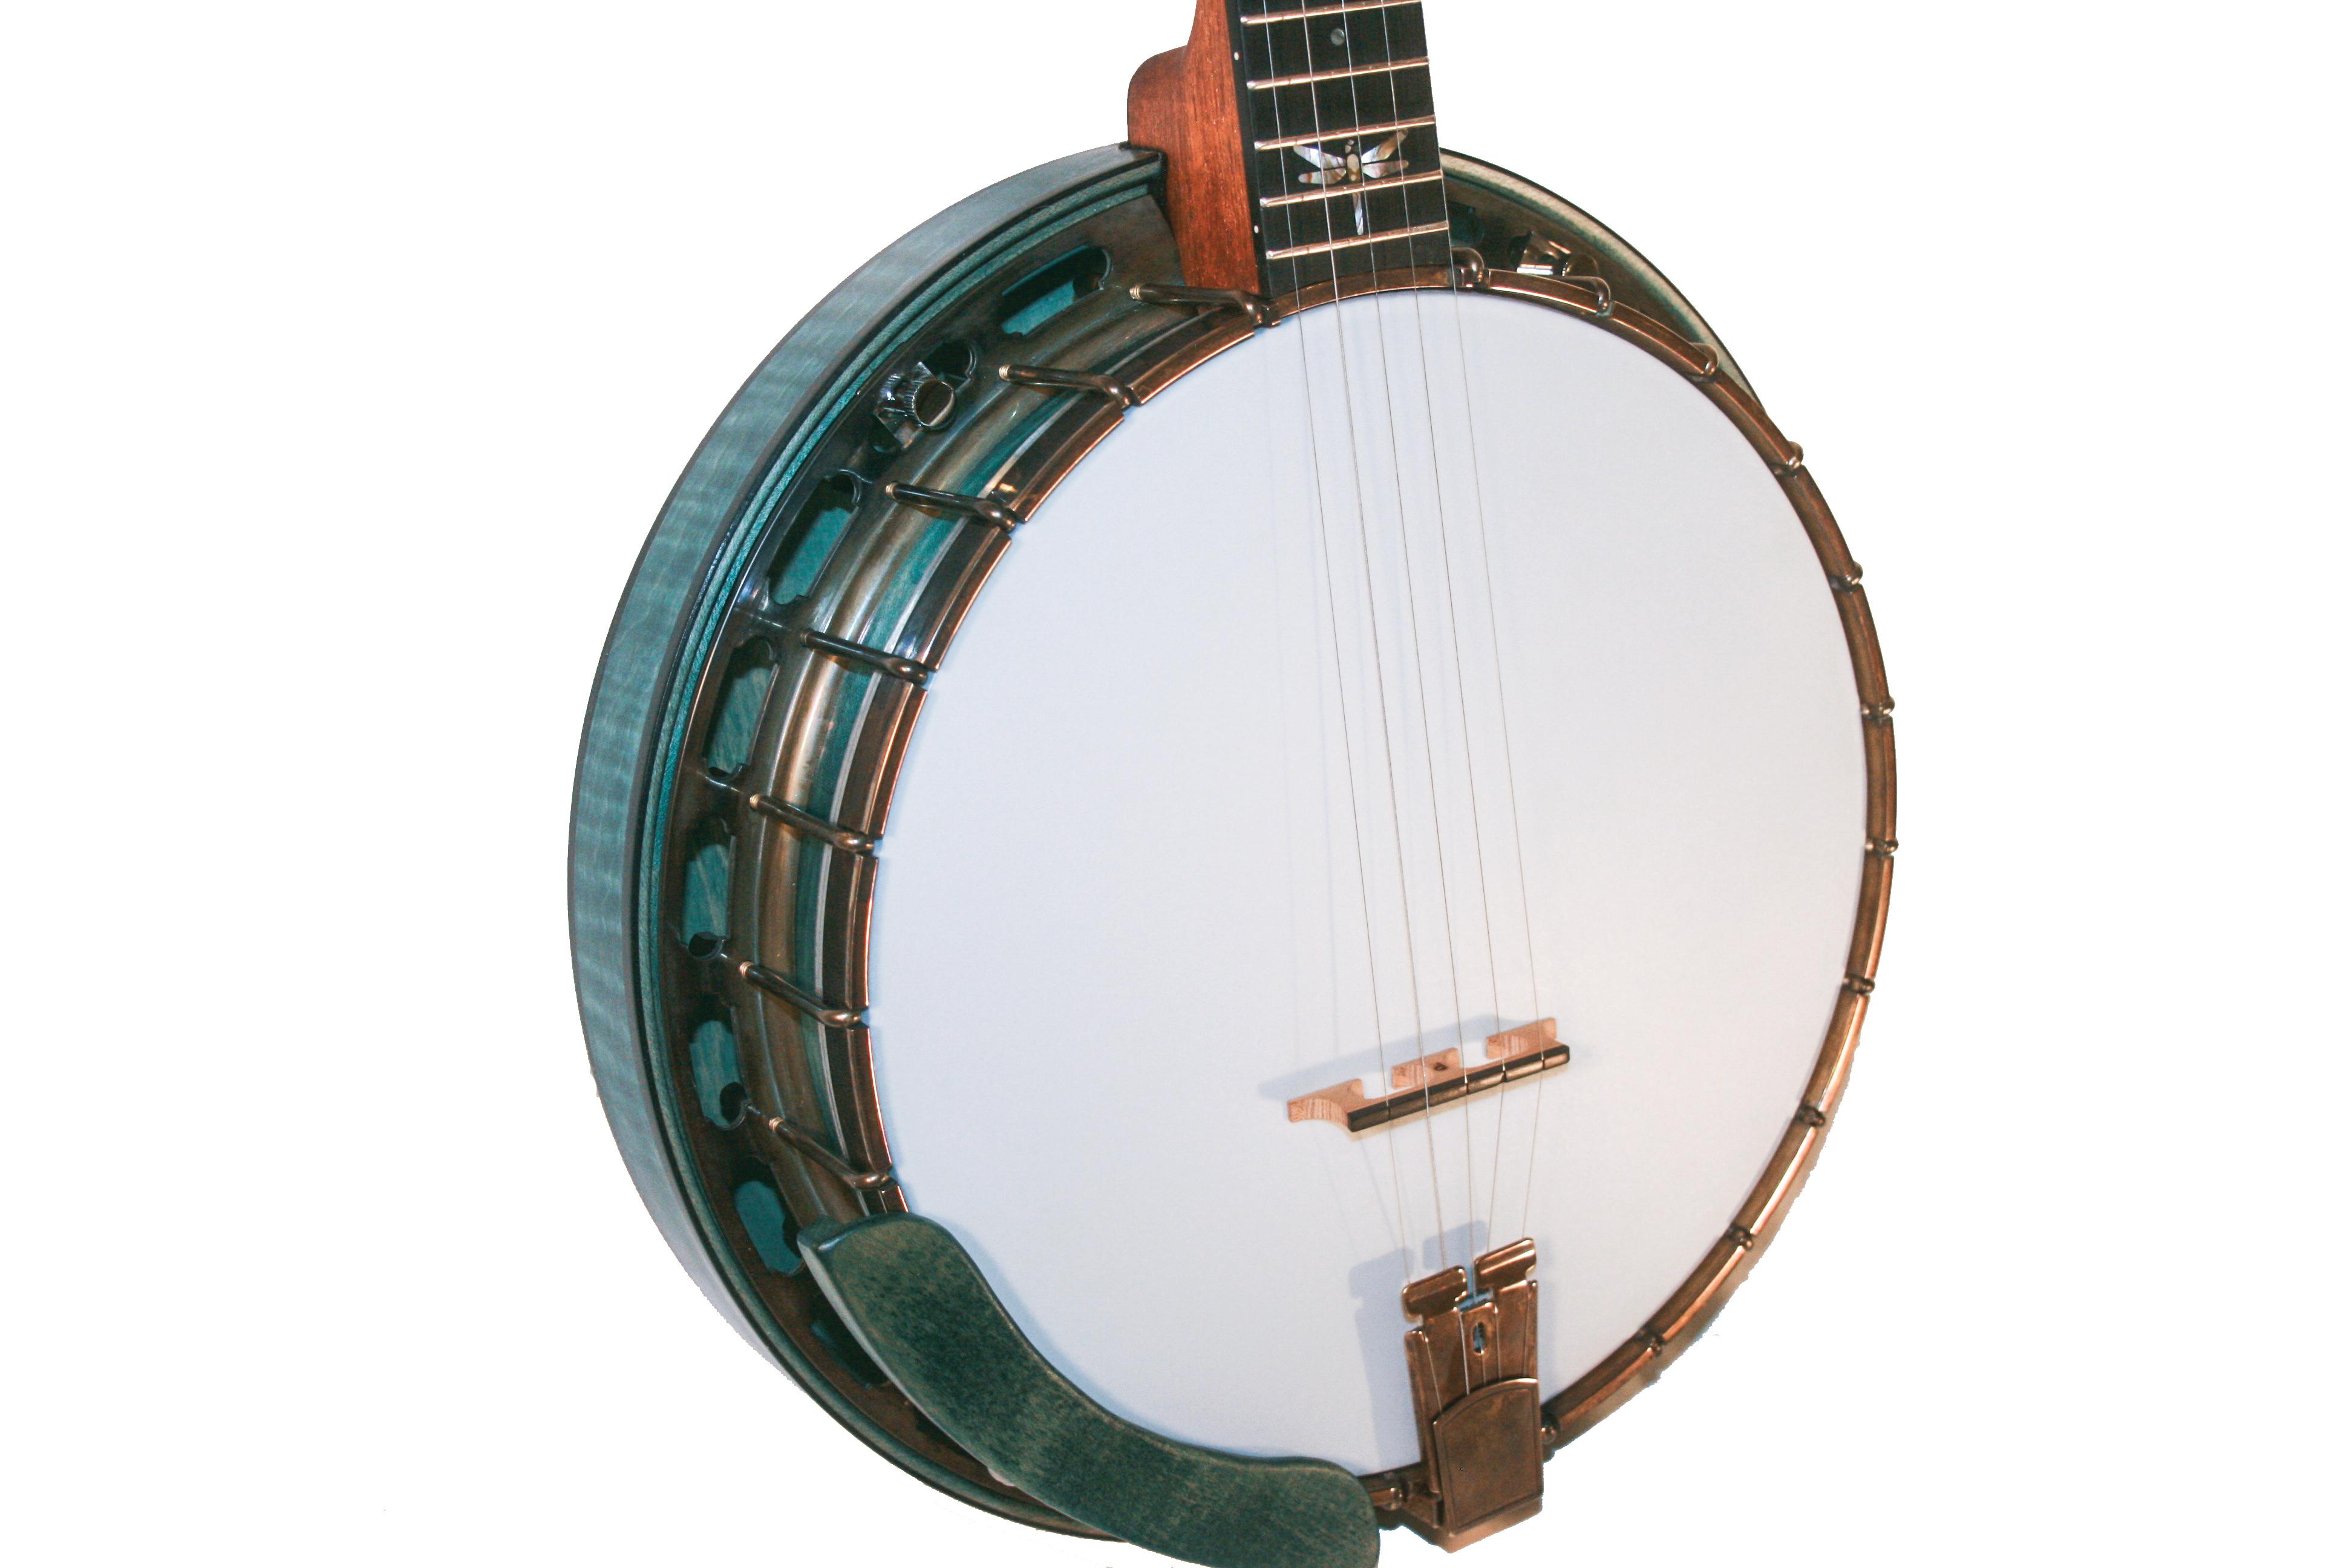 banjo front